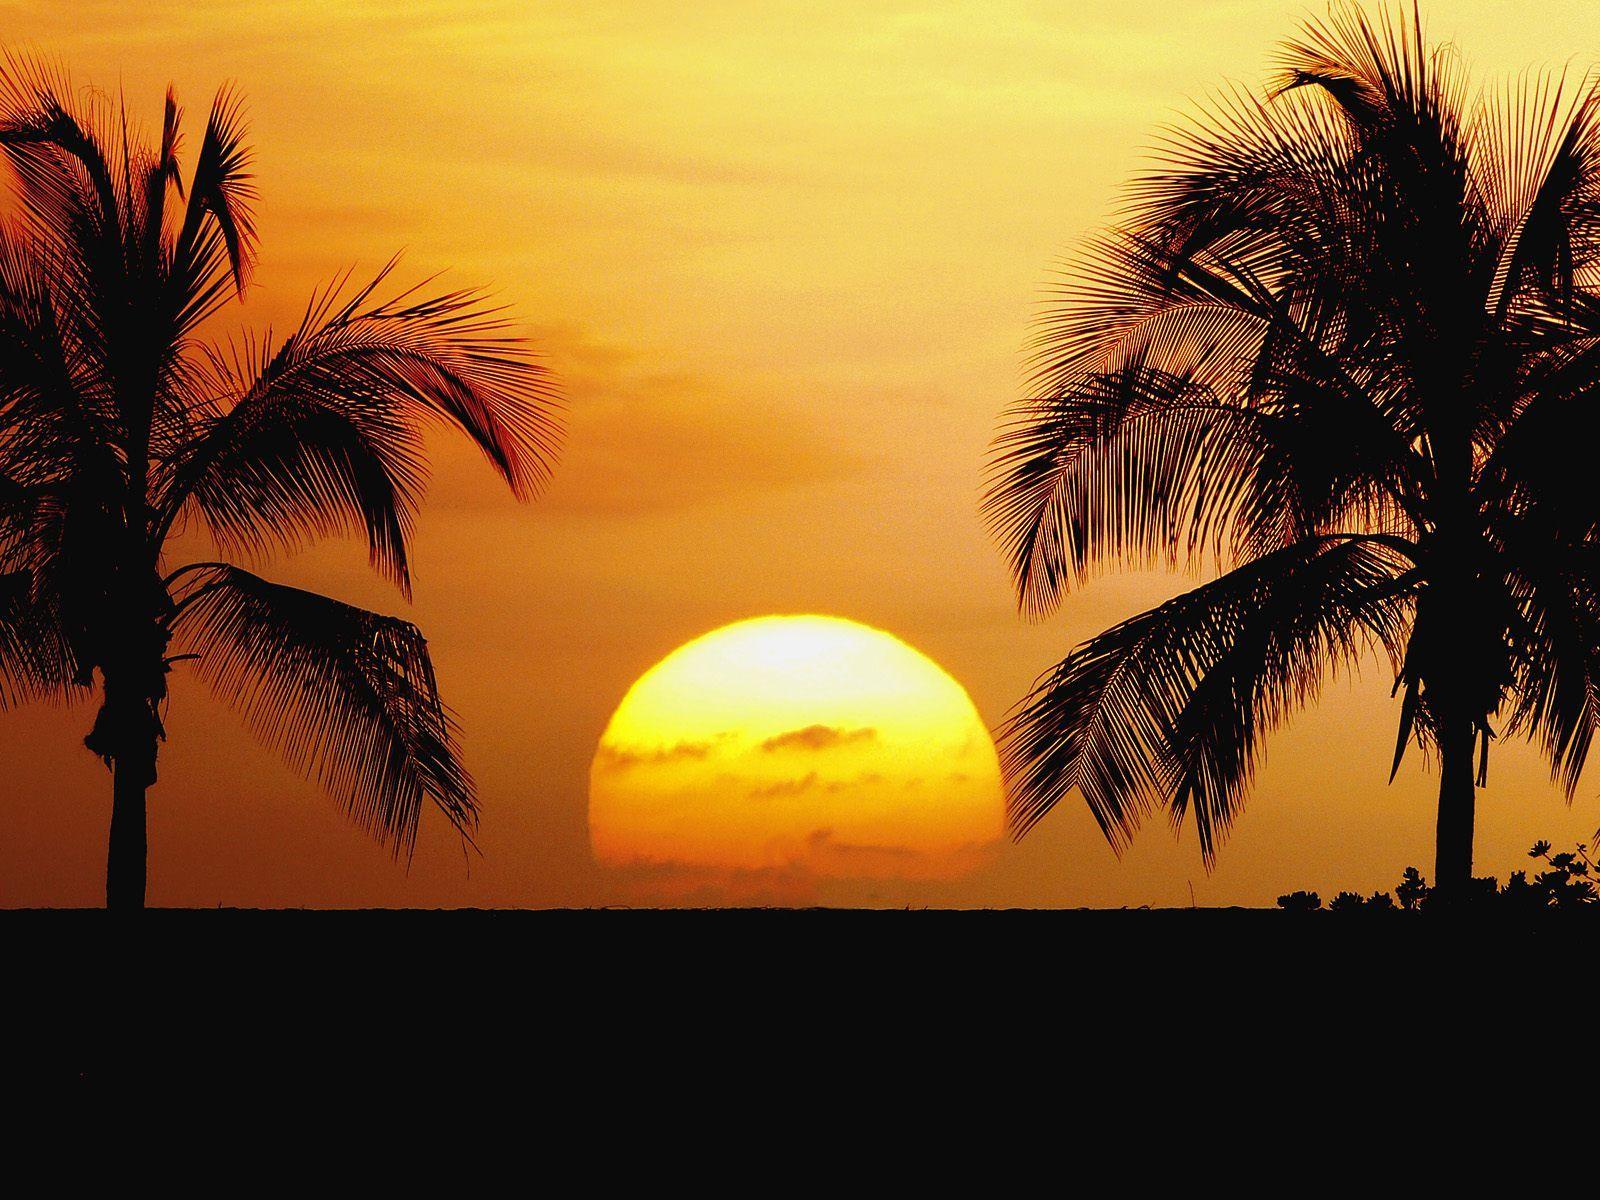 Dream Wedding With Hawaii Beach Sunset Wallpaper Best Travel Sites 1600x1200